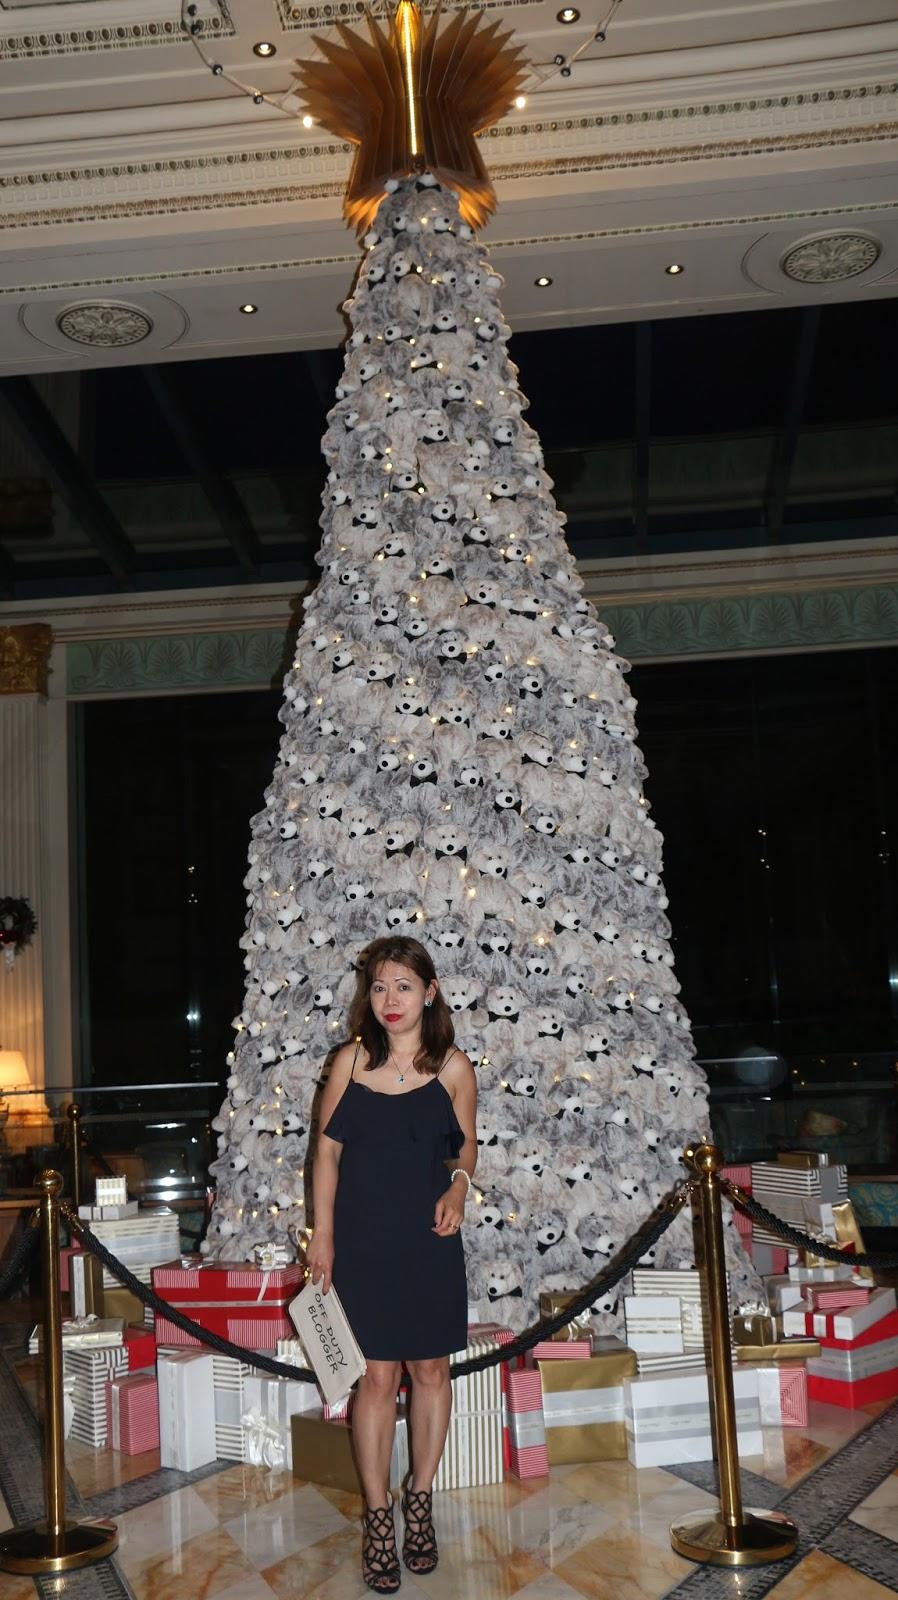 Stuffed toy Christmas tree